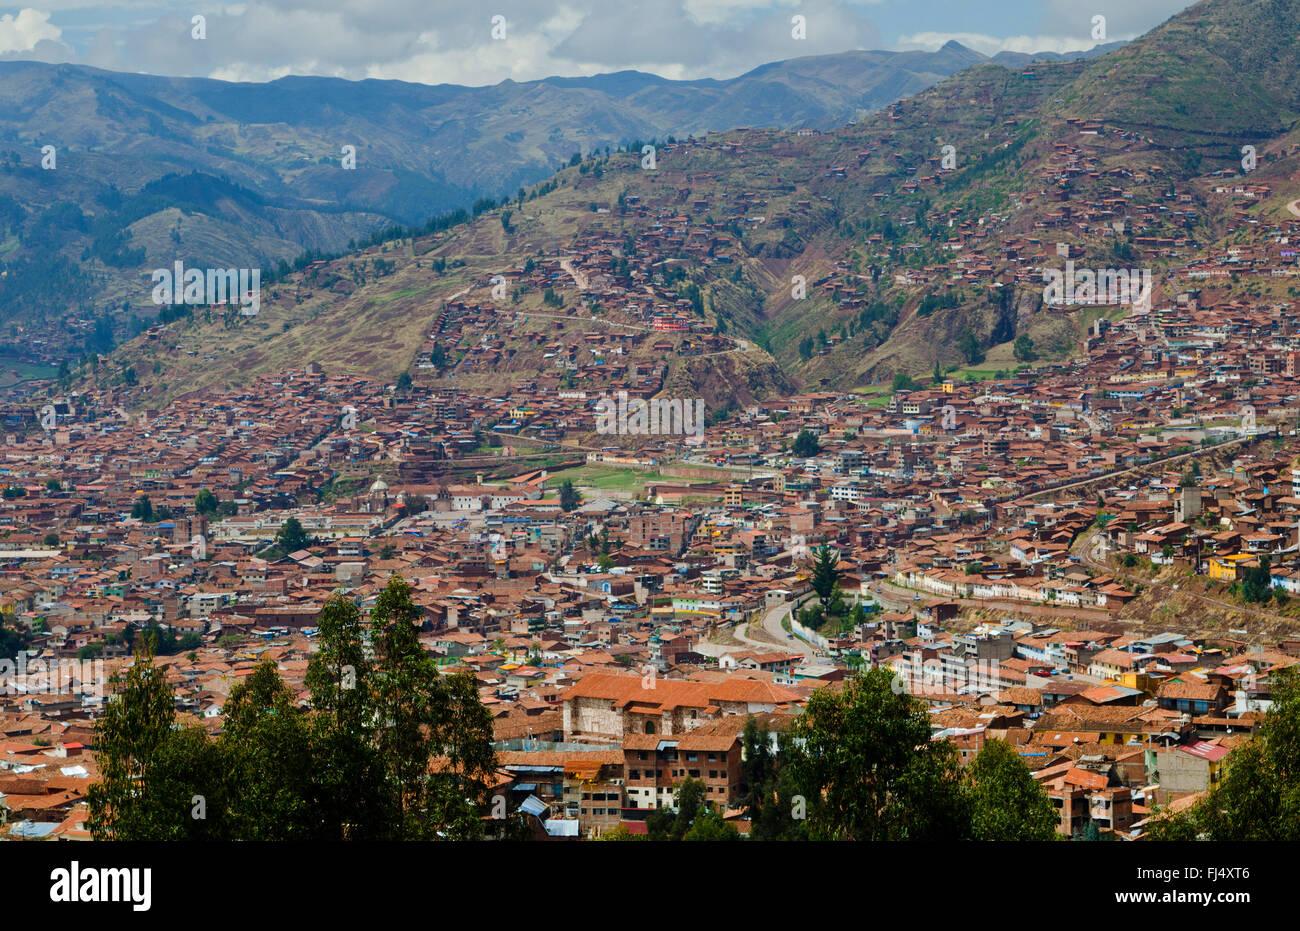 Mountain living near cusco peru royalty free stock photo - Aerial Of Cusco With Mountains Above City Peru Cuzco